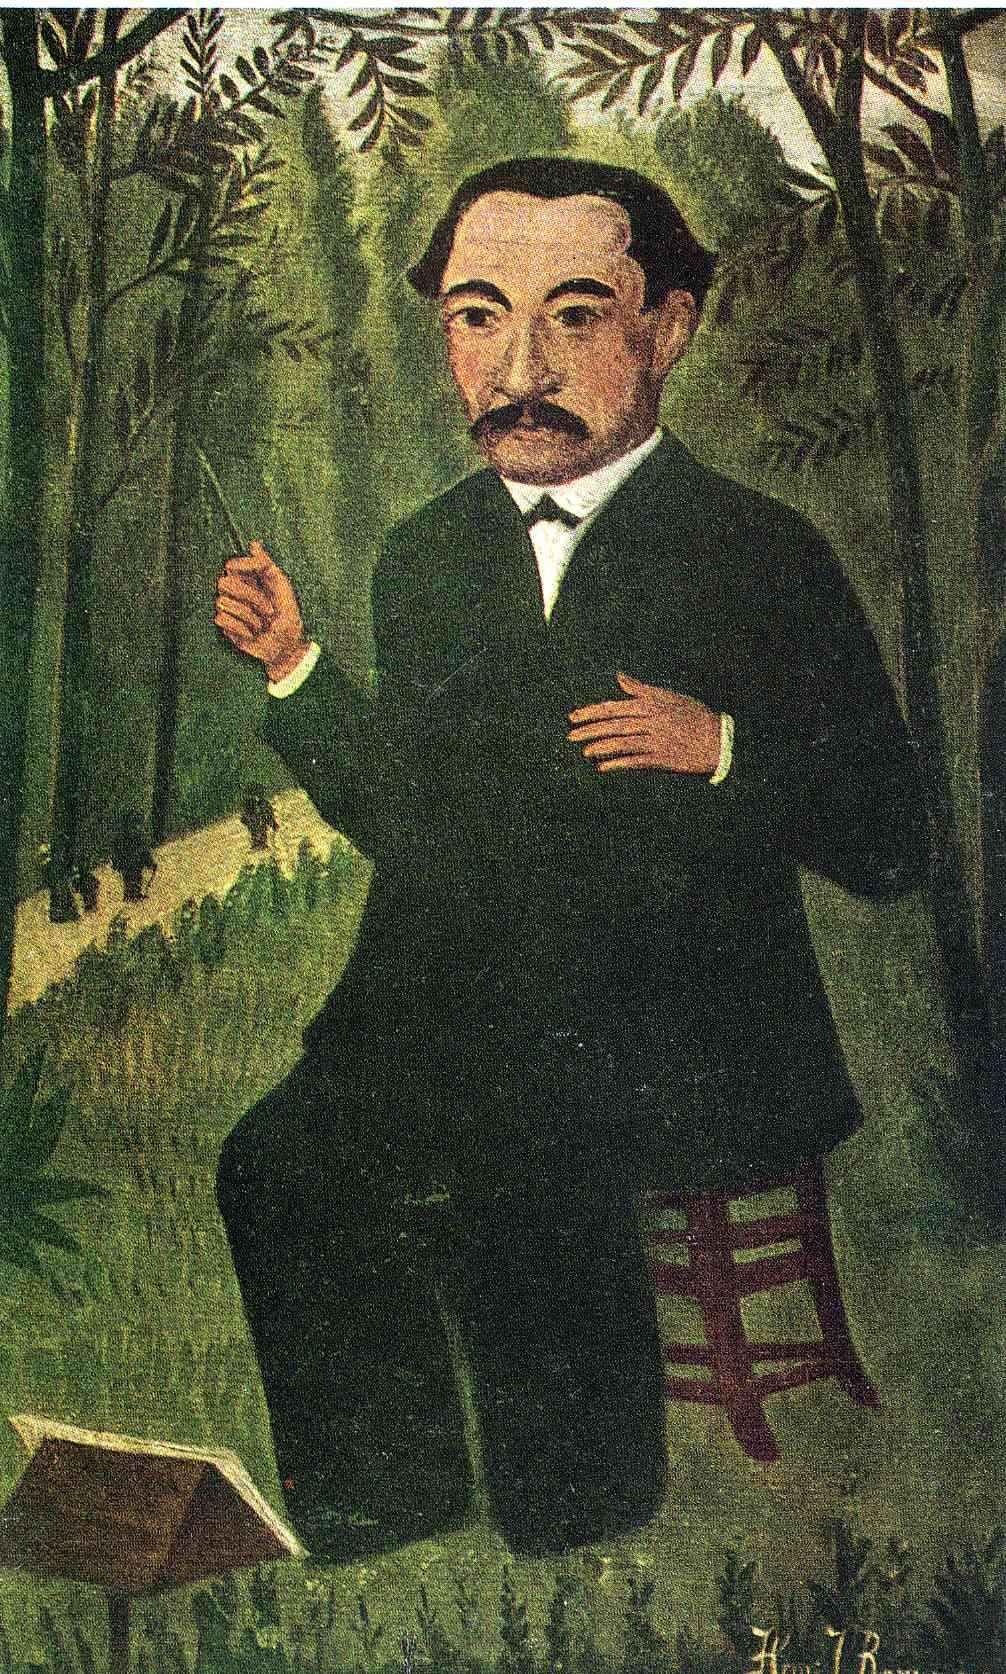 Henri Rousseau. Henri Rousseau, as a conductor